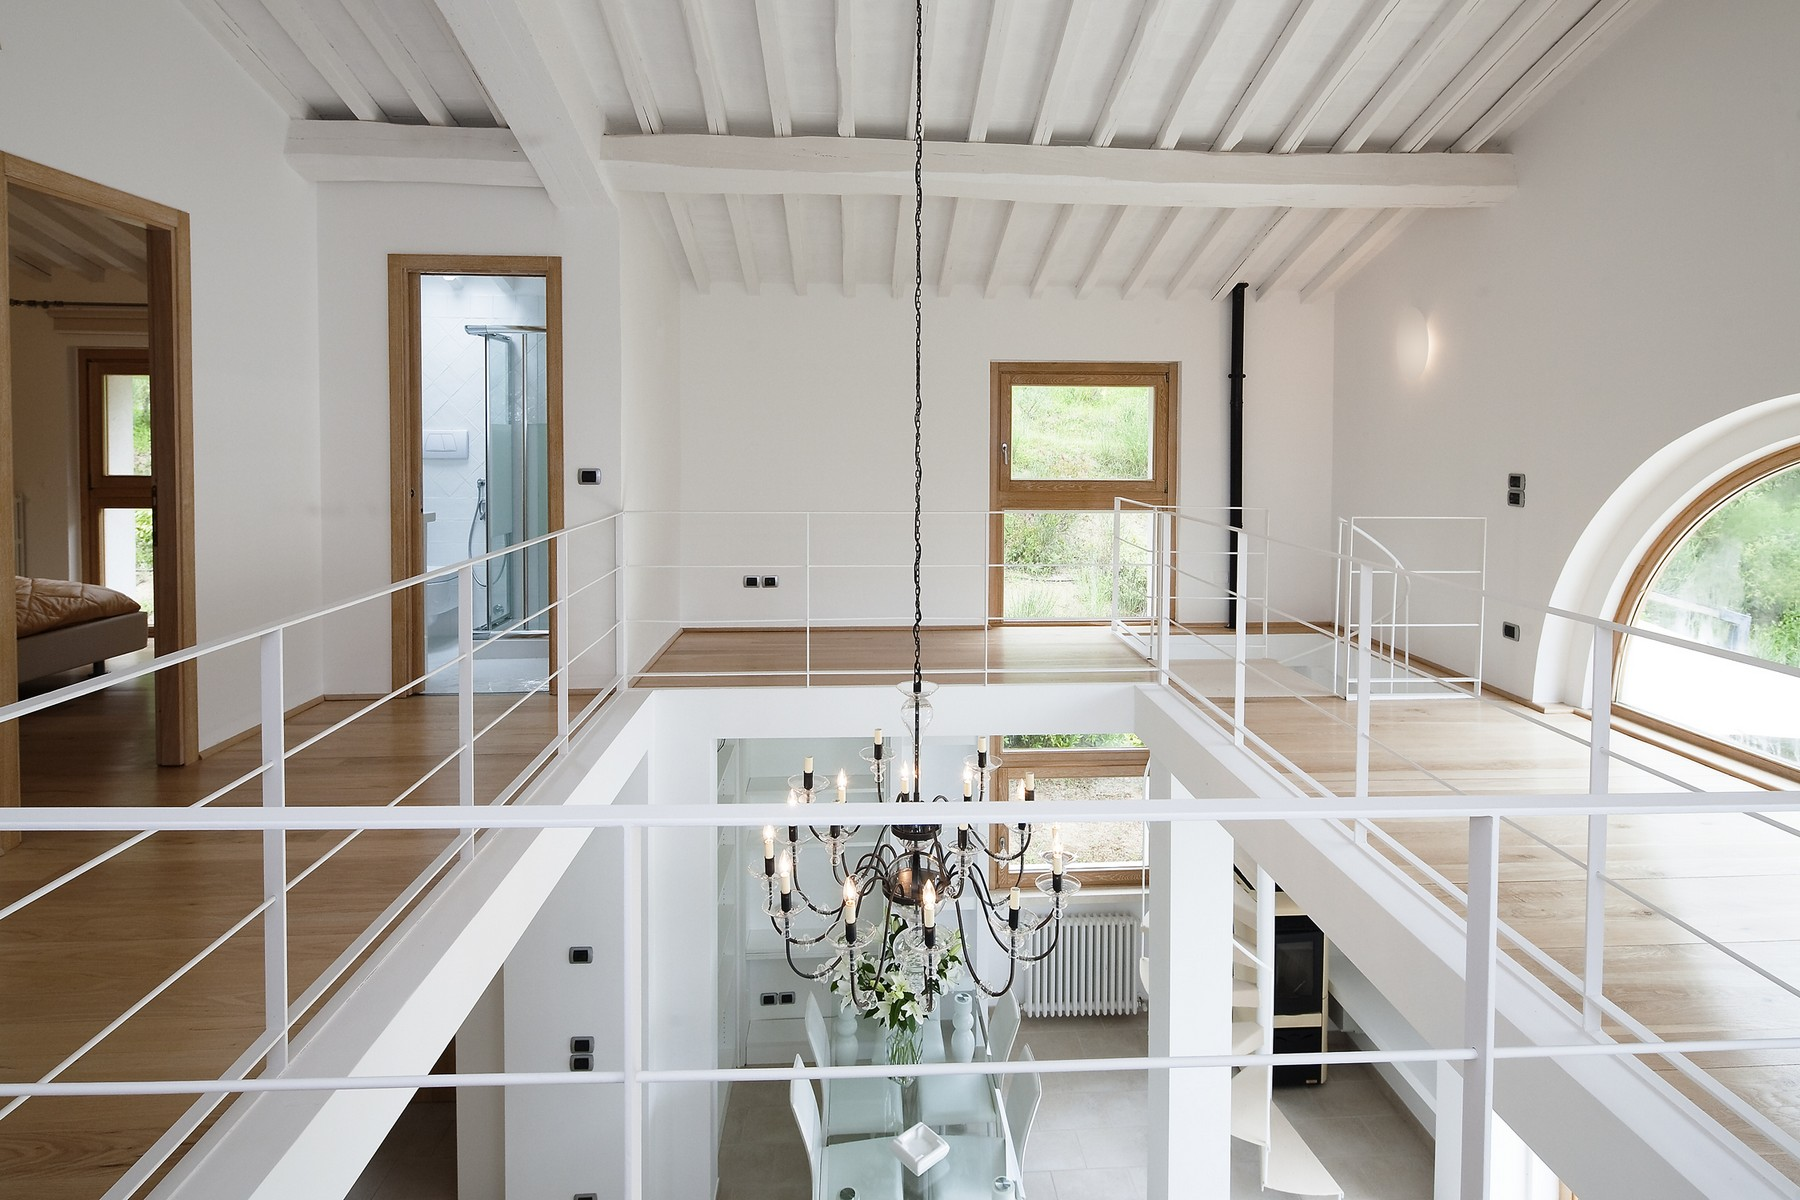 Additional photo for property listing at Design house overlooking Perugia Montelaguardia Perugia, Perugia 06135 Italien